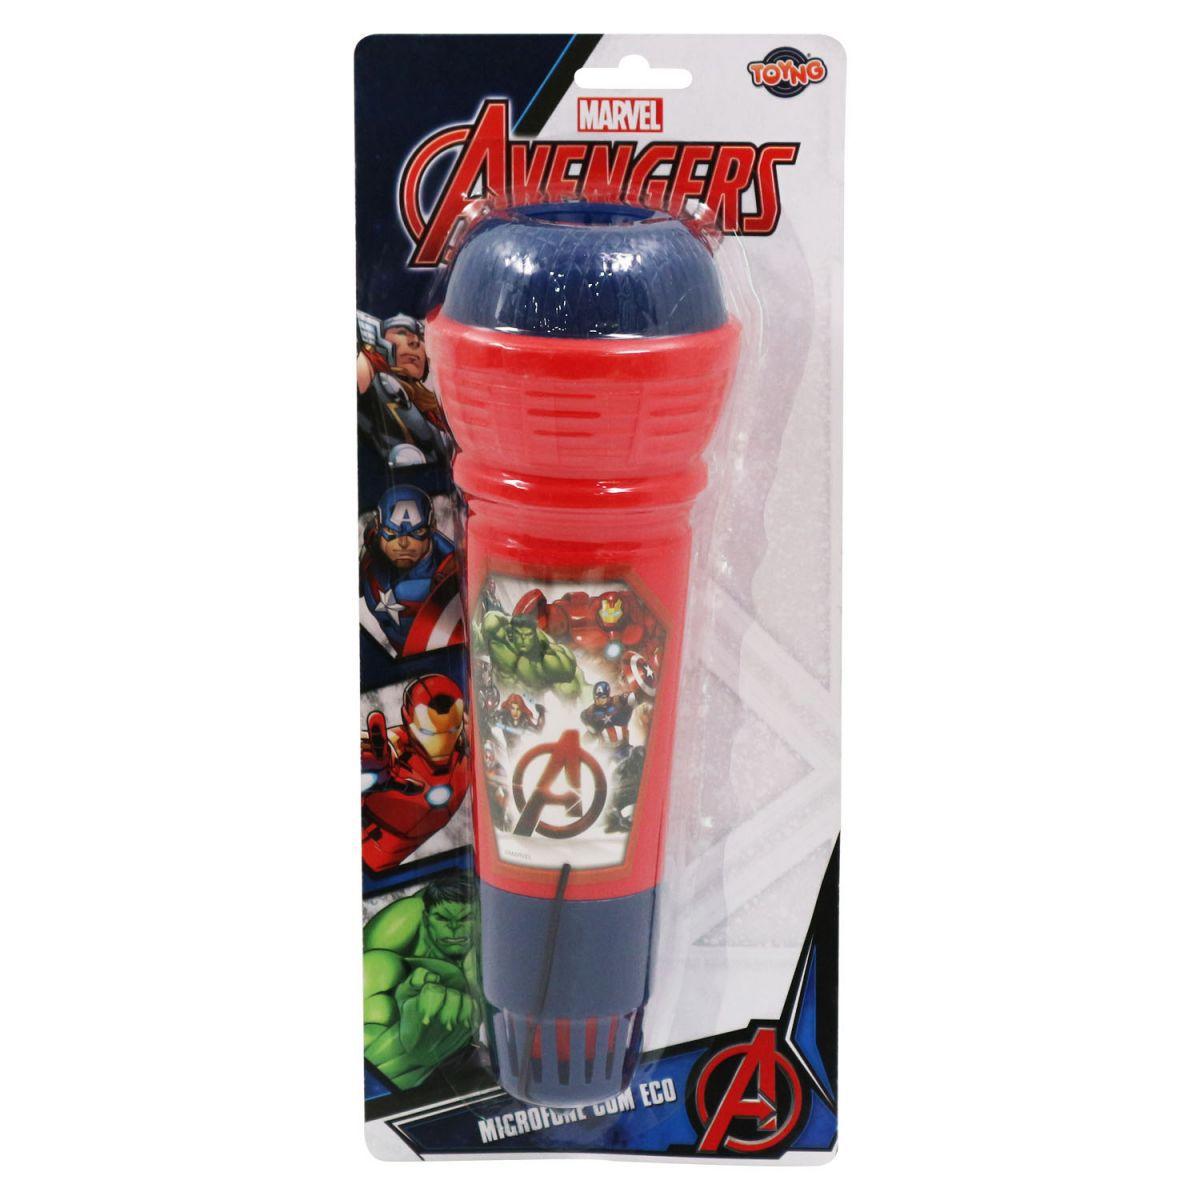 Microfone Avengers com Eco - Toyng